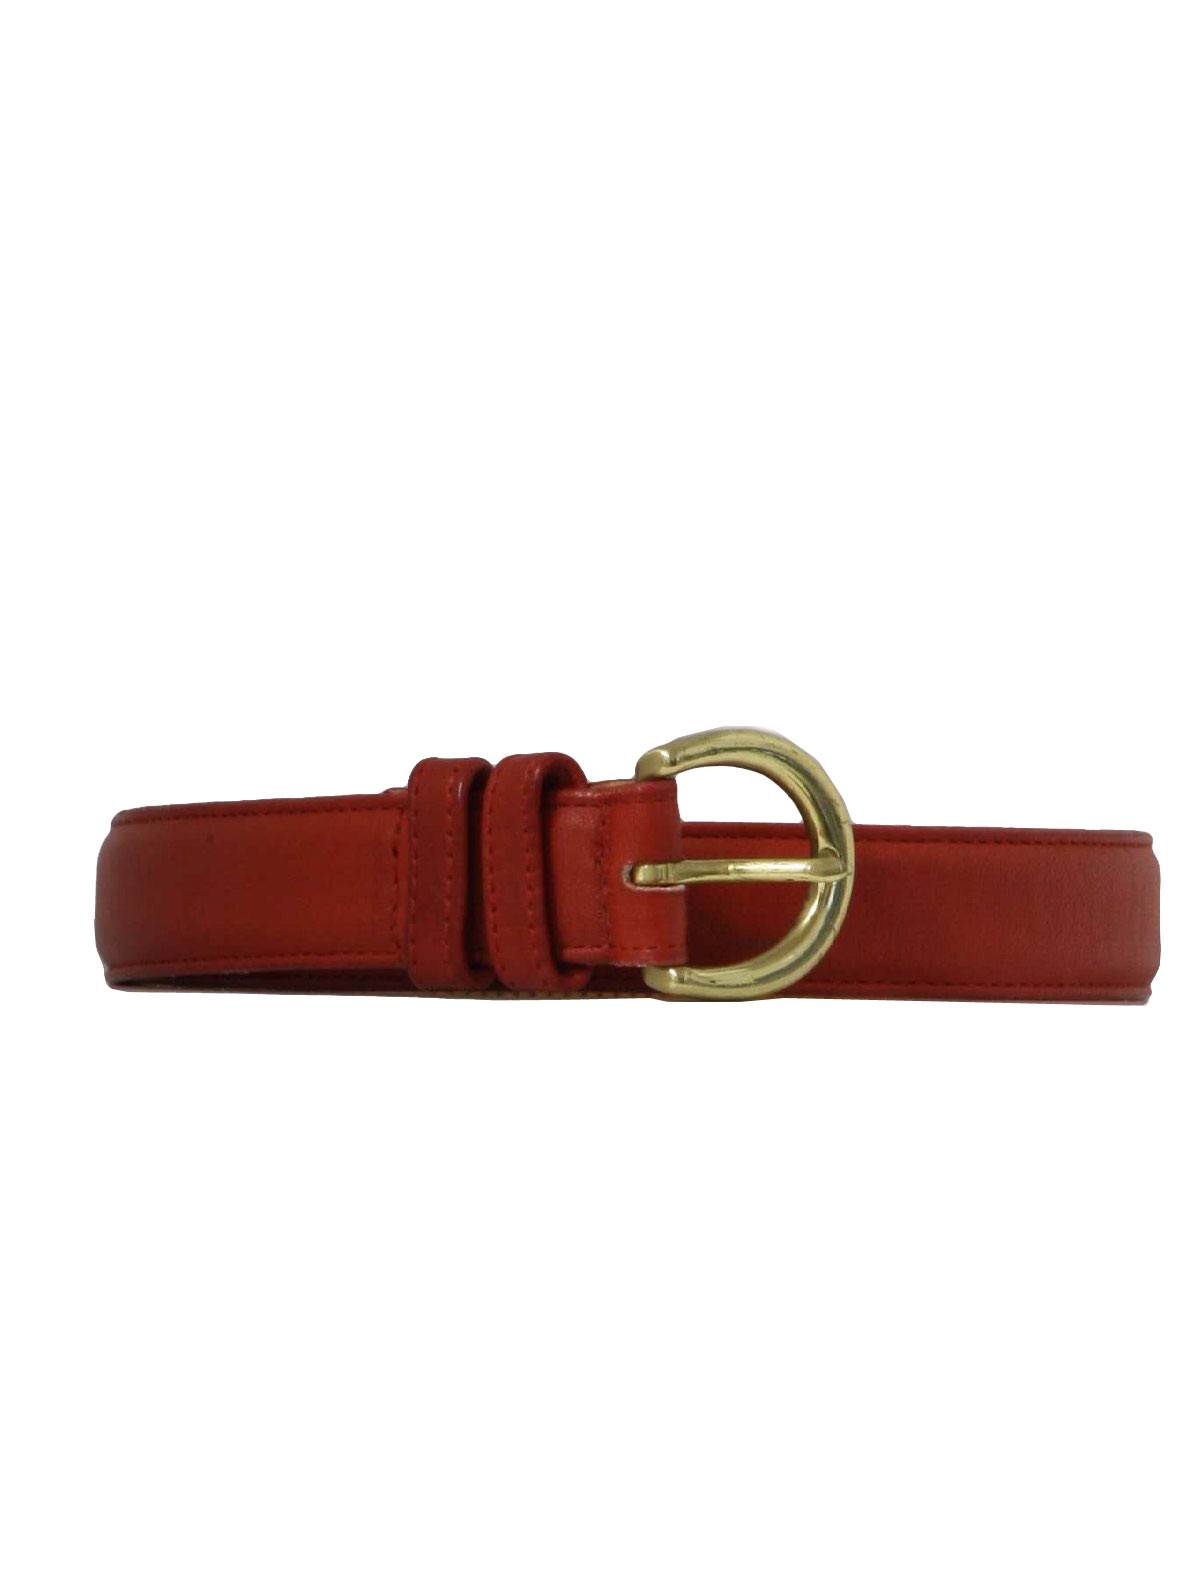 bf0ae1ec0ad92 90 s Coach Belt  90s -Coach- Designer Womens red leather glove ...